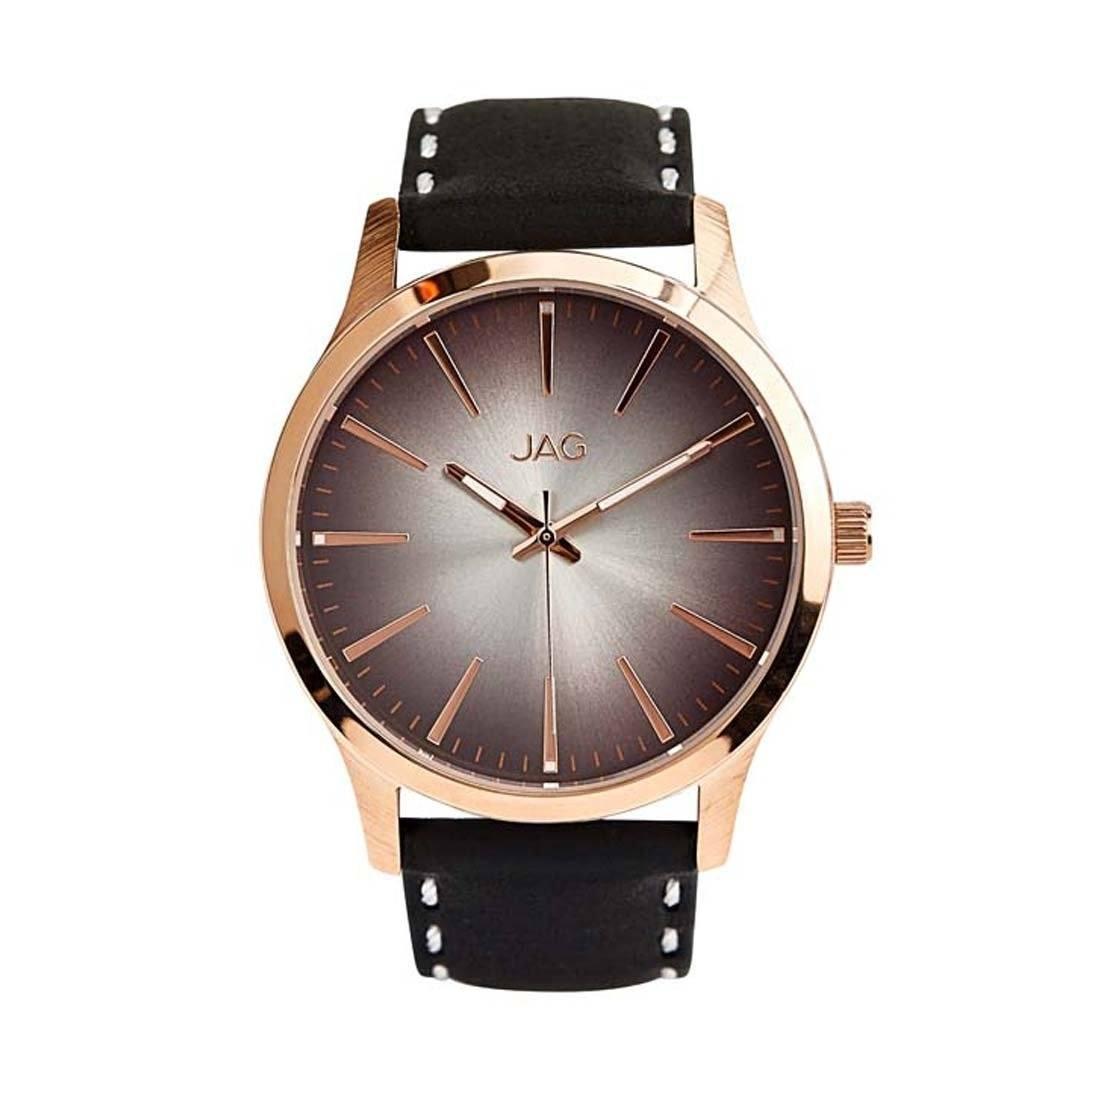 Jag Hunter Mens Watch Model J2000 Leather-Stainless Steel 3 Hands 9325452000363 Black